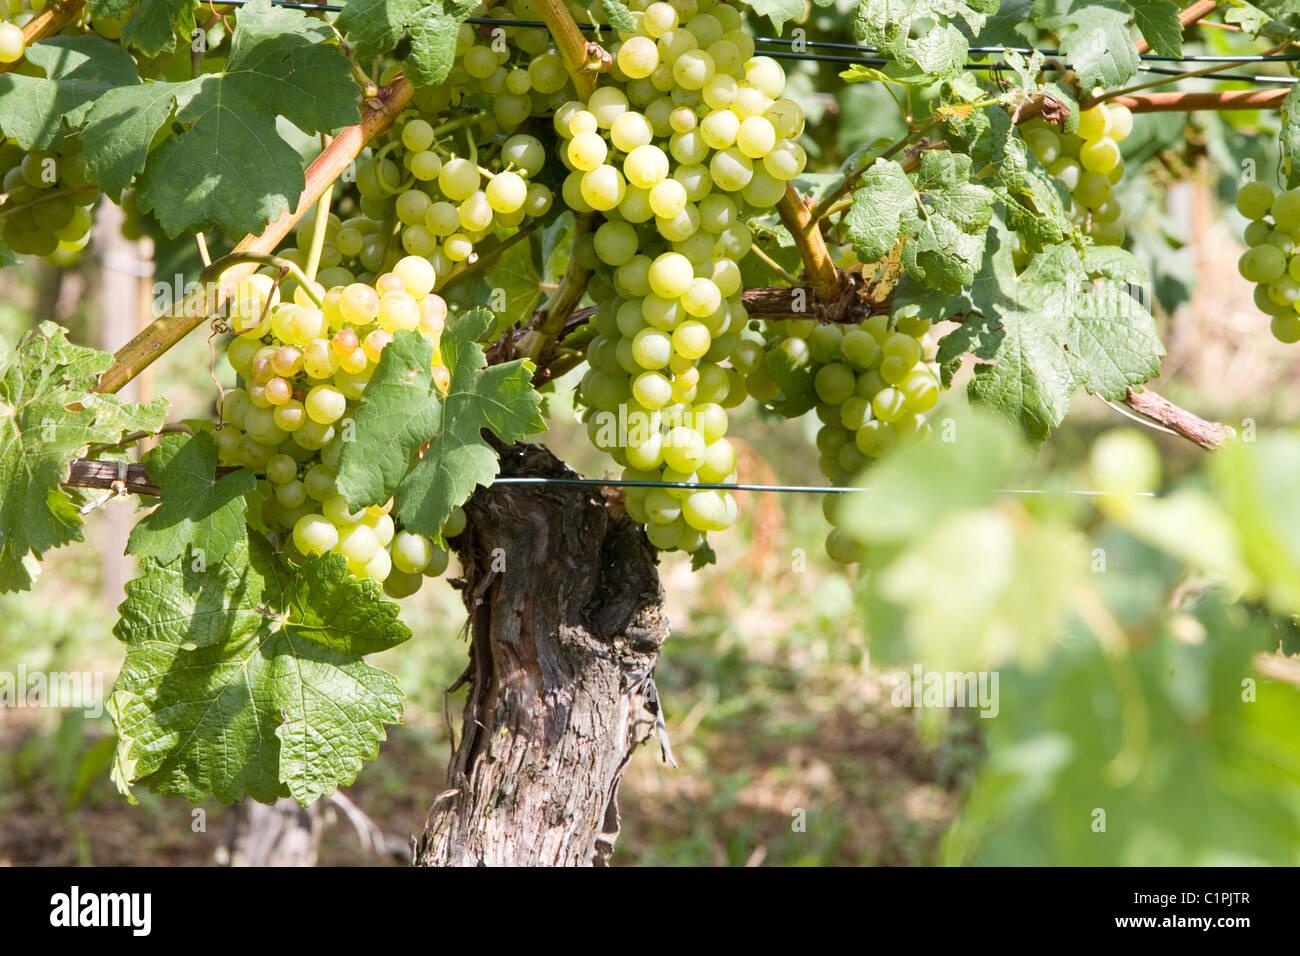 South Germany, Bavaria, Reichenau, grapes on vine - Stock Image